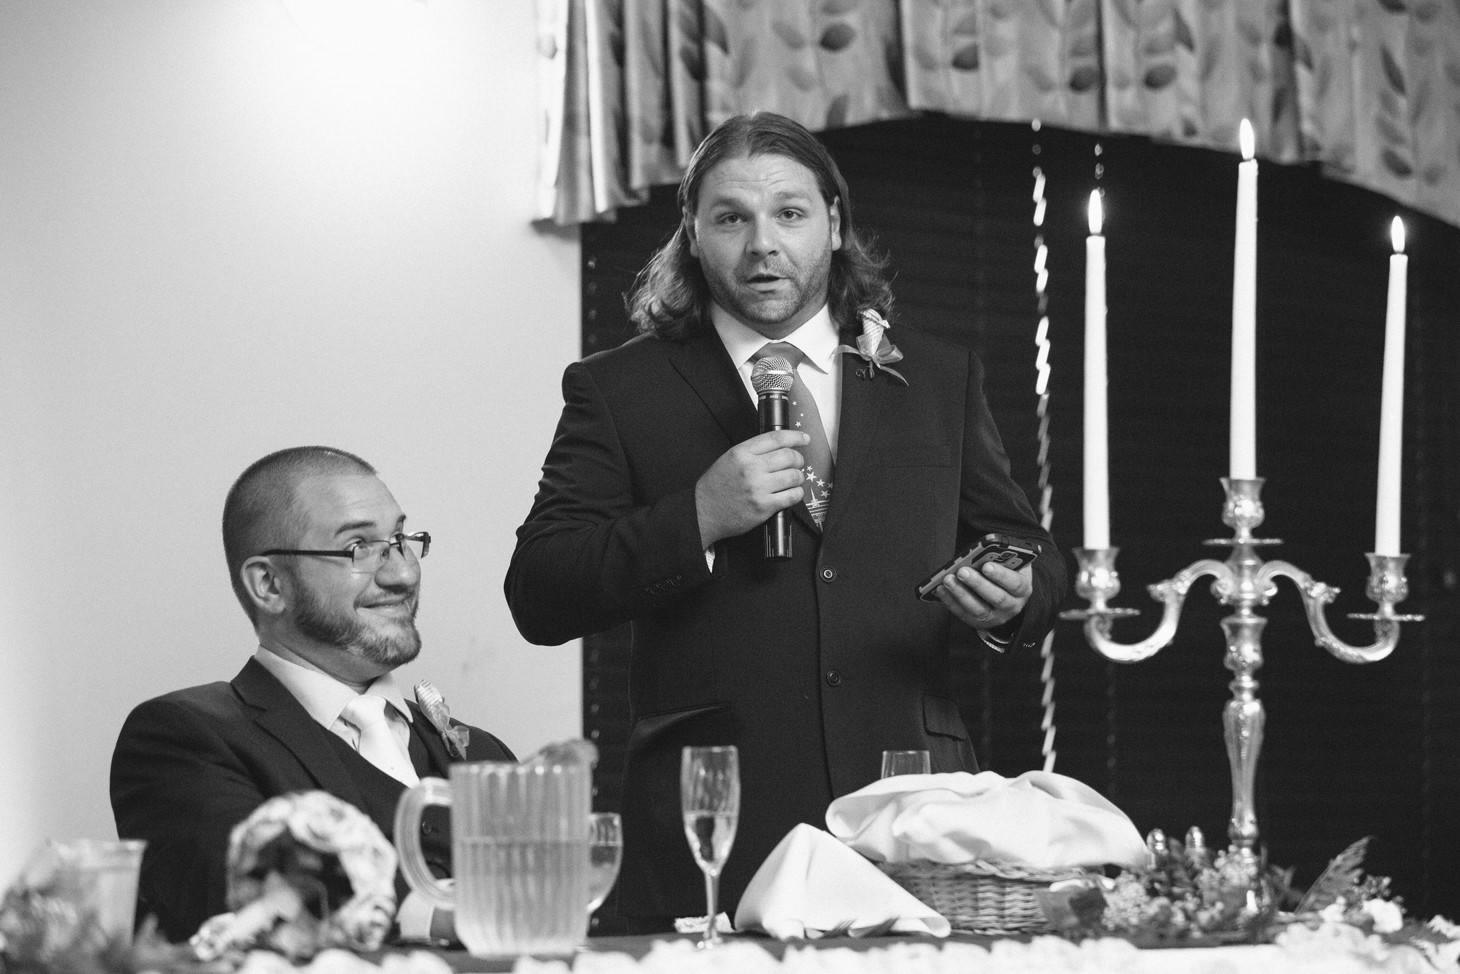 032-nyc-wedding-photographer-nj-nerdy-dr-who-firehouse-wedding-smitten-chickens.jpg